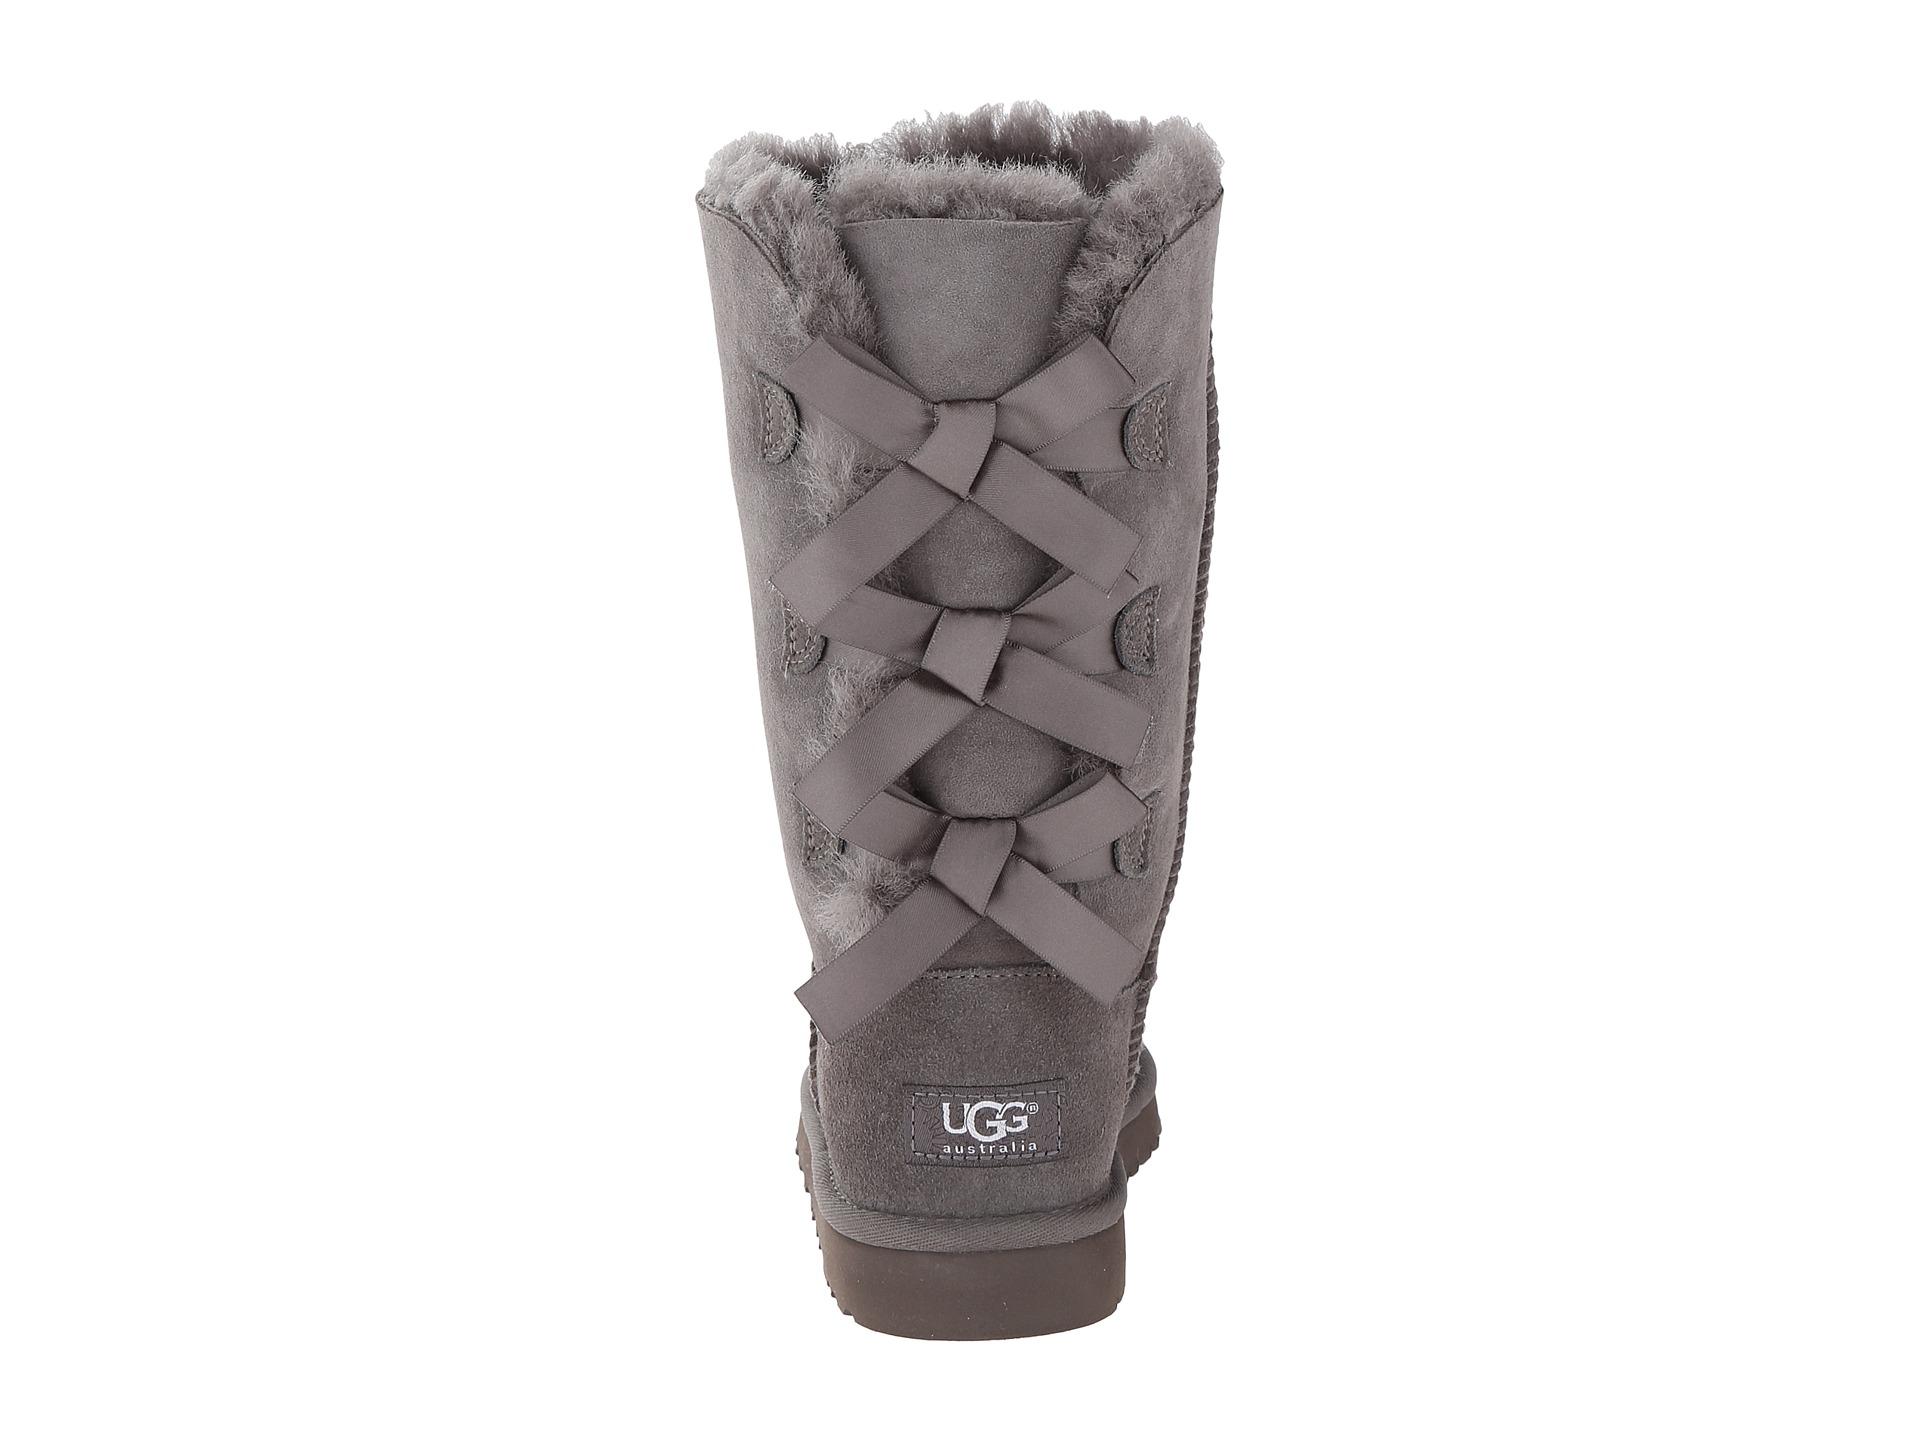 grey uggs size 5